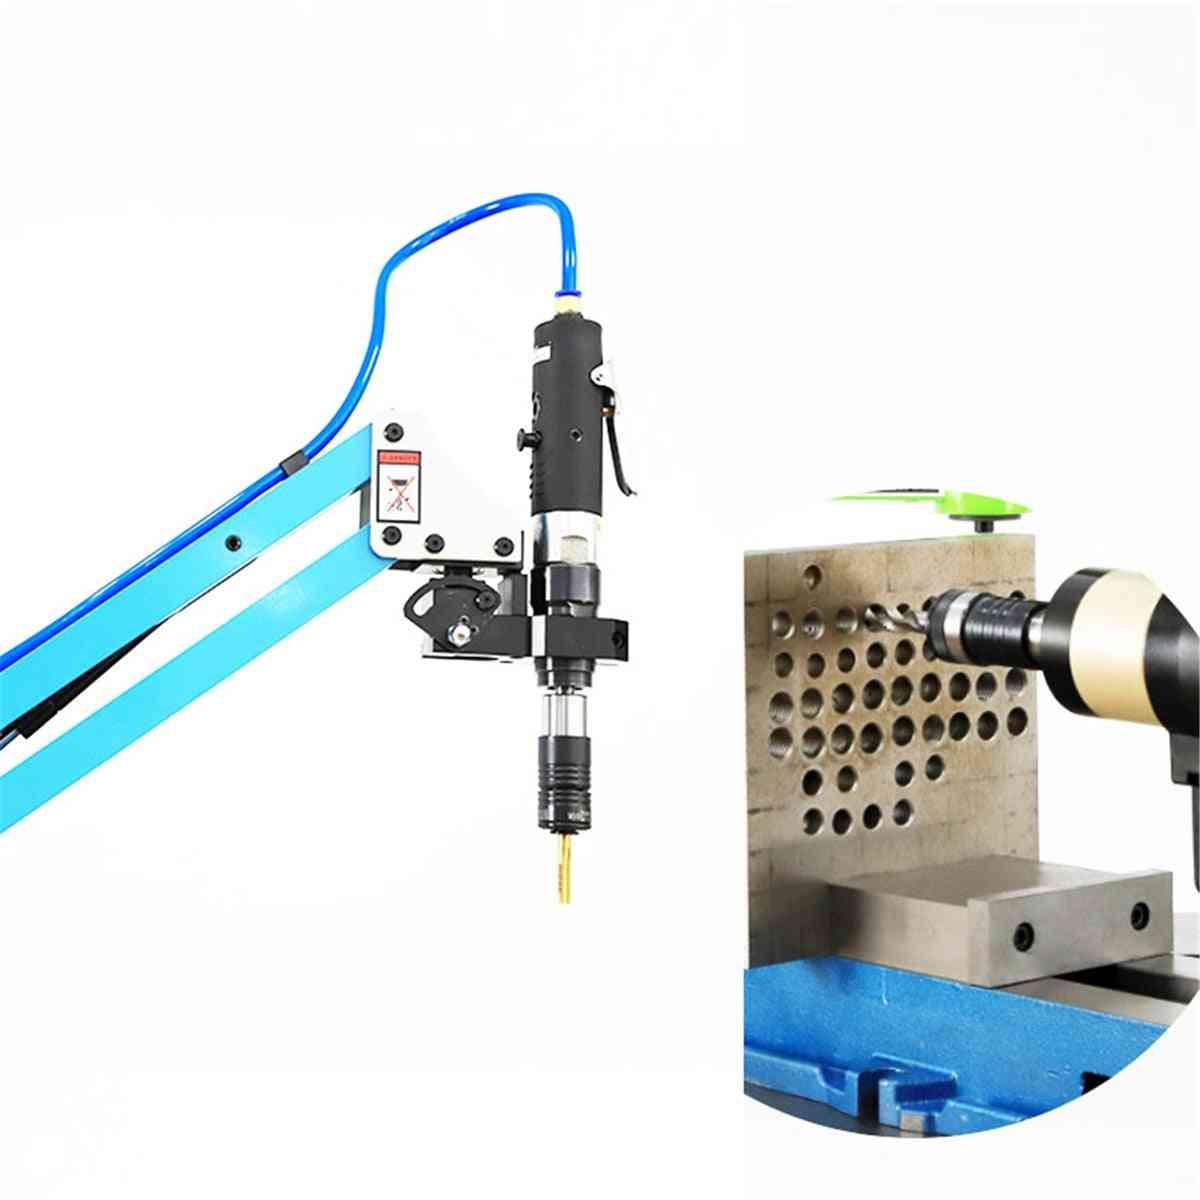 M3-m12 Universal Type Pneumatic Air Tapping Drilling Machine